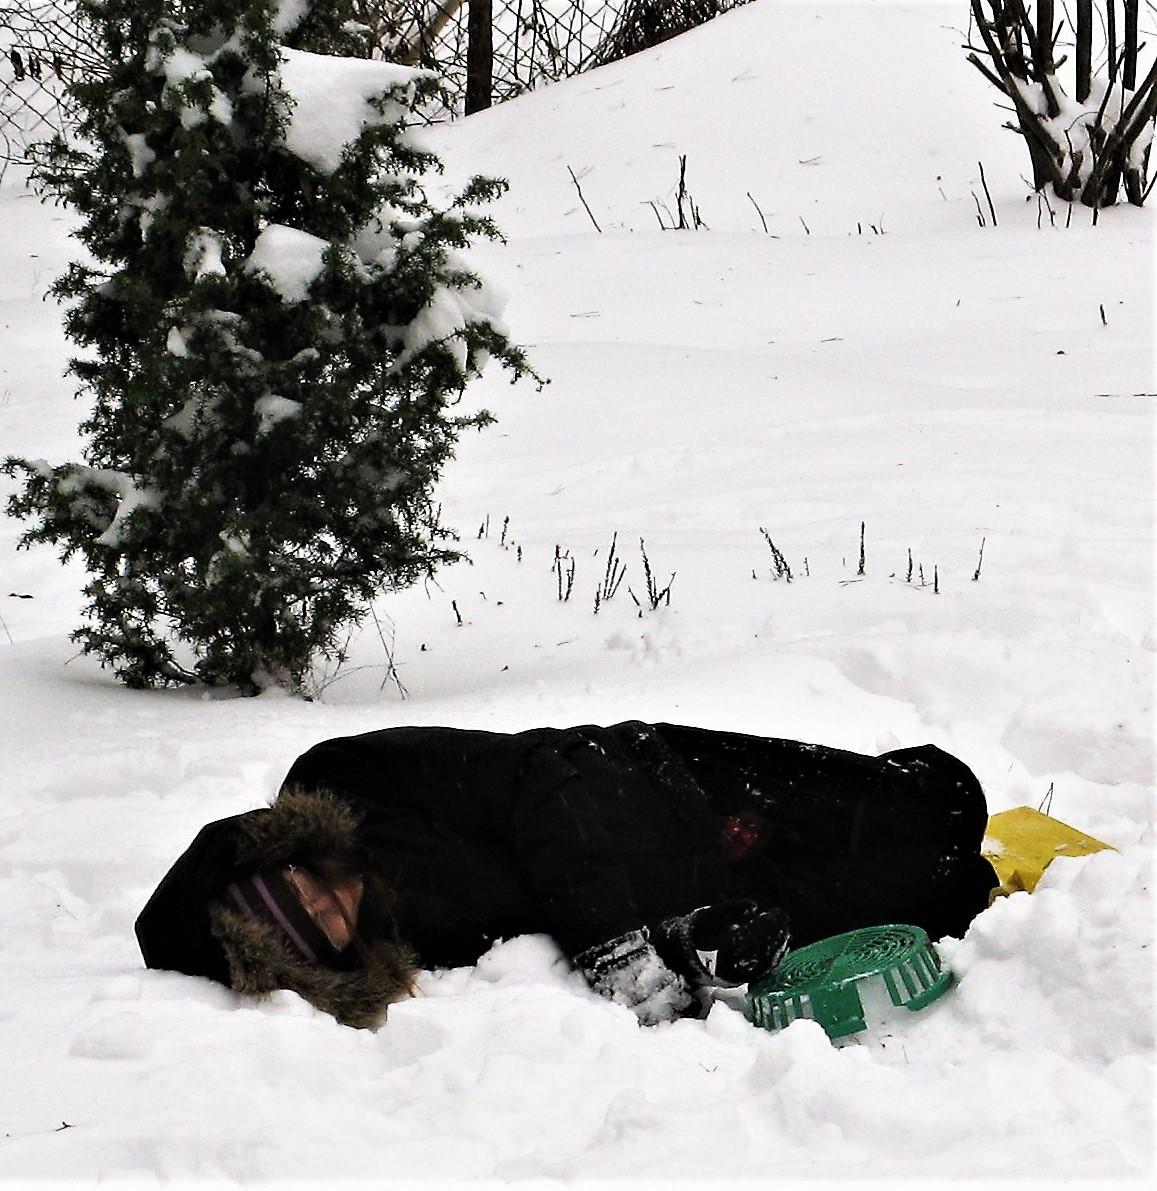 zima_ferie 2010 022